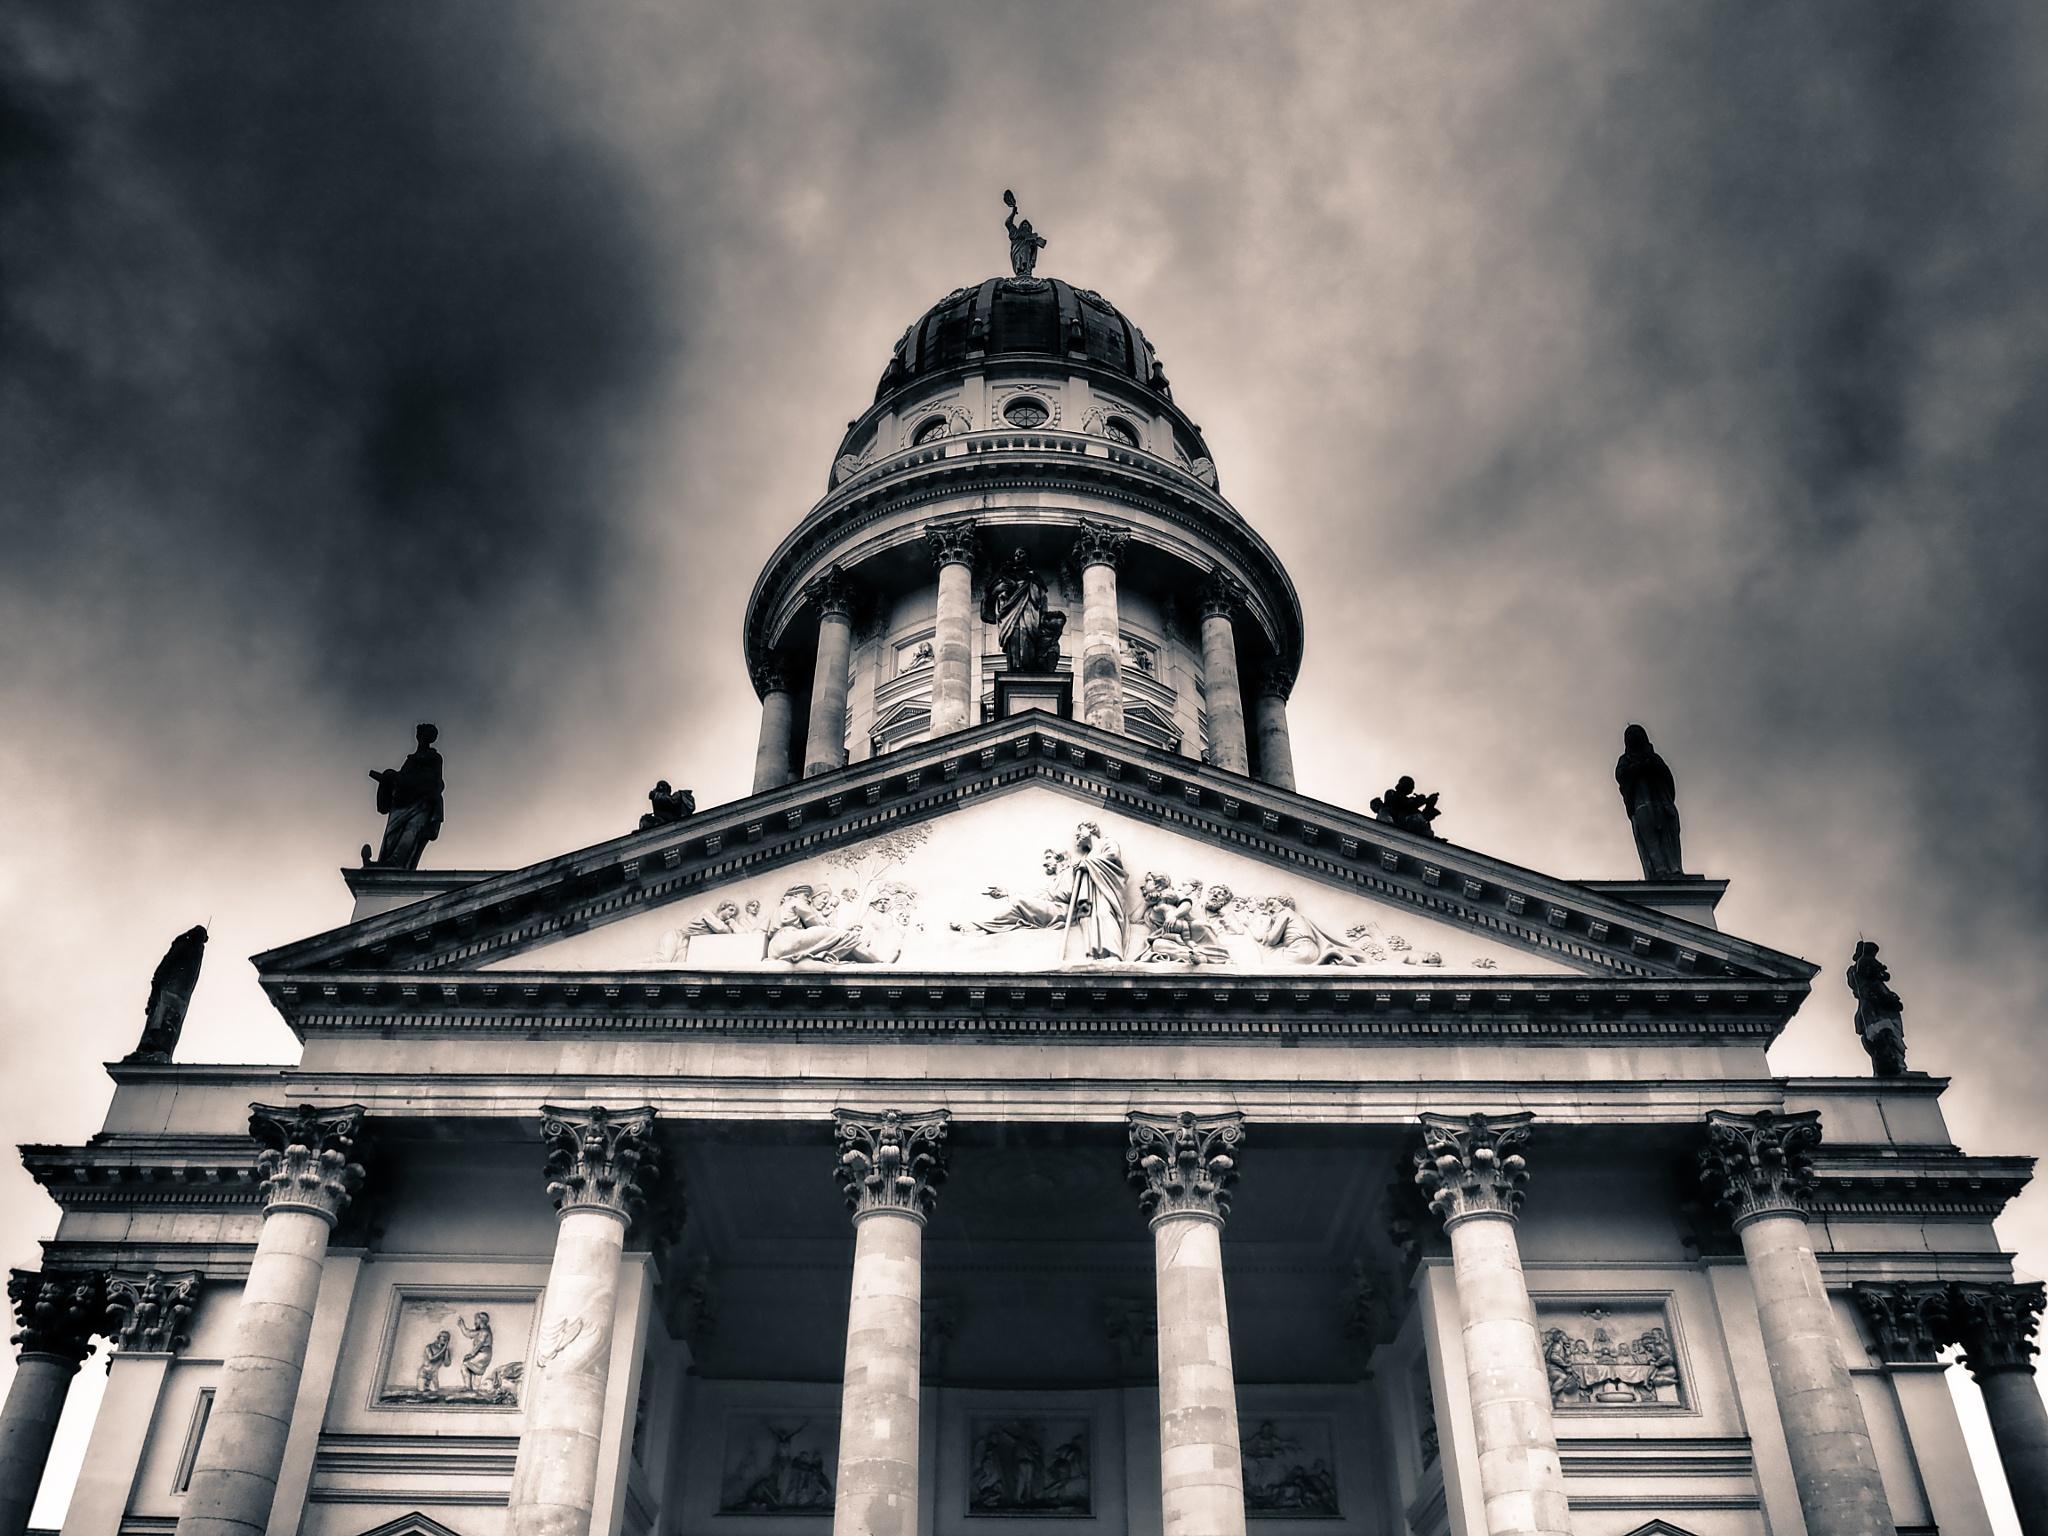 Berlin France Dom Black & White by Jeans Brown Photography / Jens Schwarz